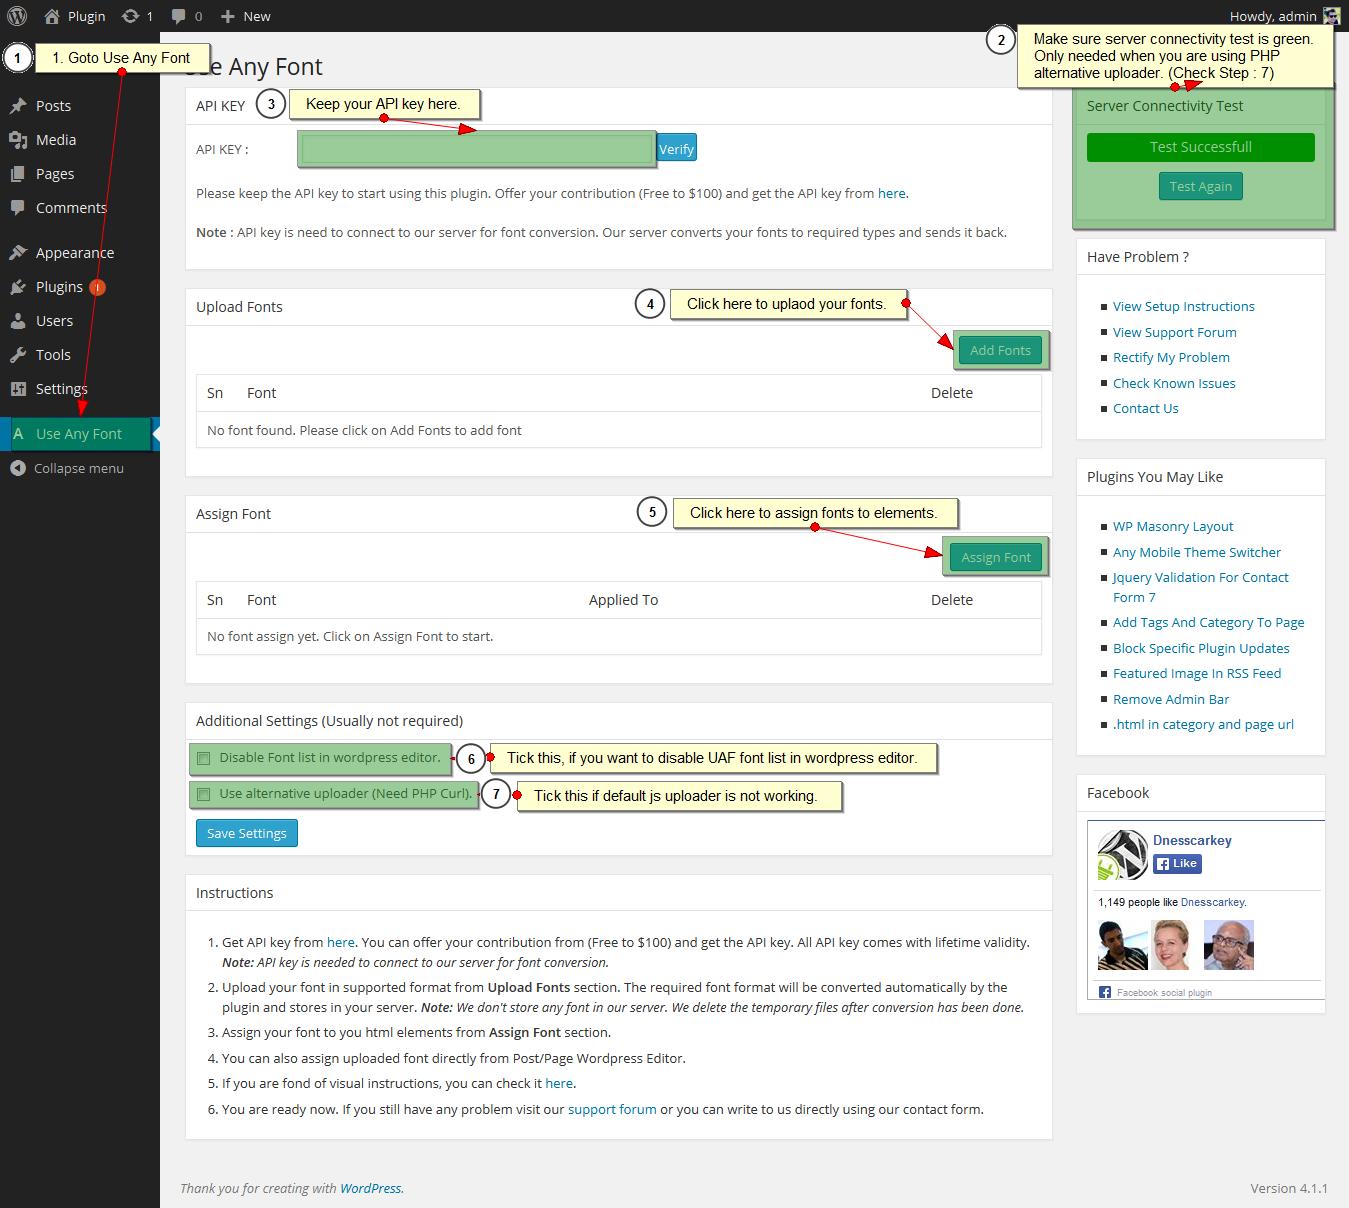 Screenshot #2. Use Any Font Plugin Setup